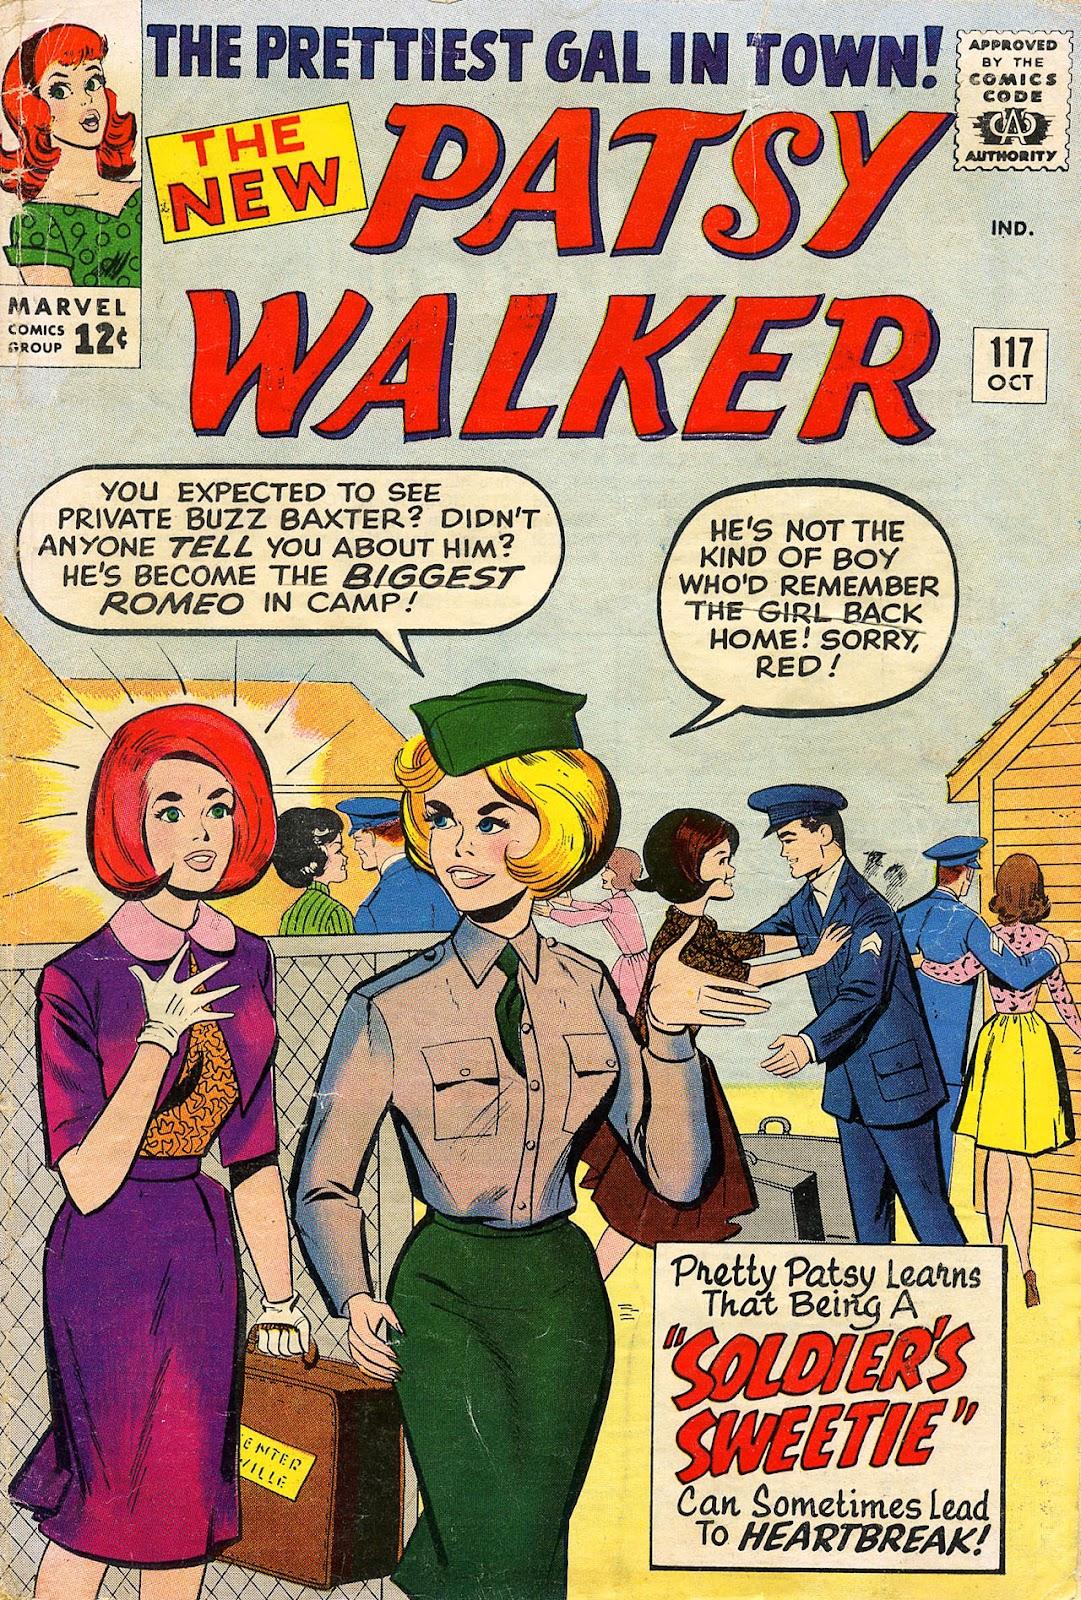 Patsy Walker 117 Page 1